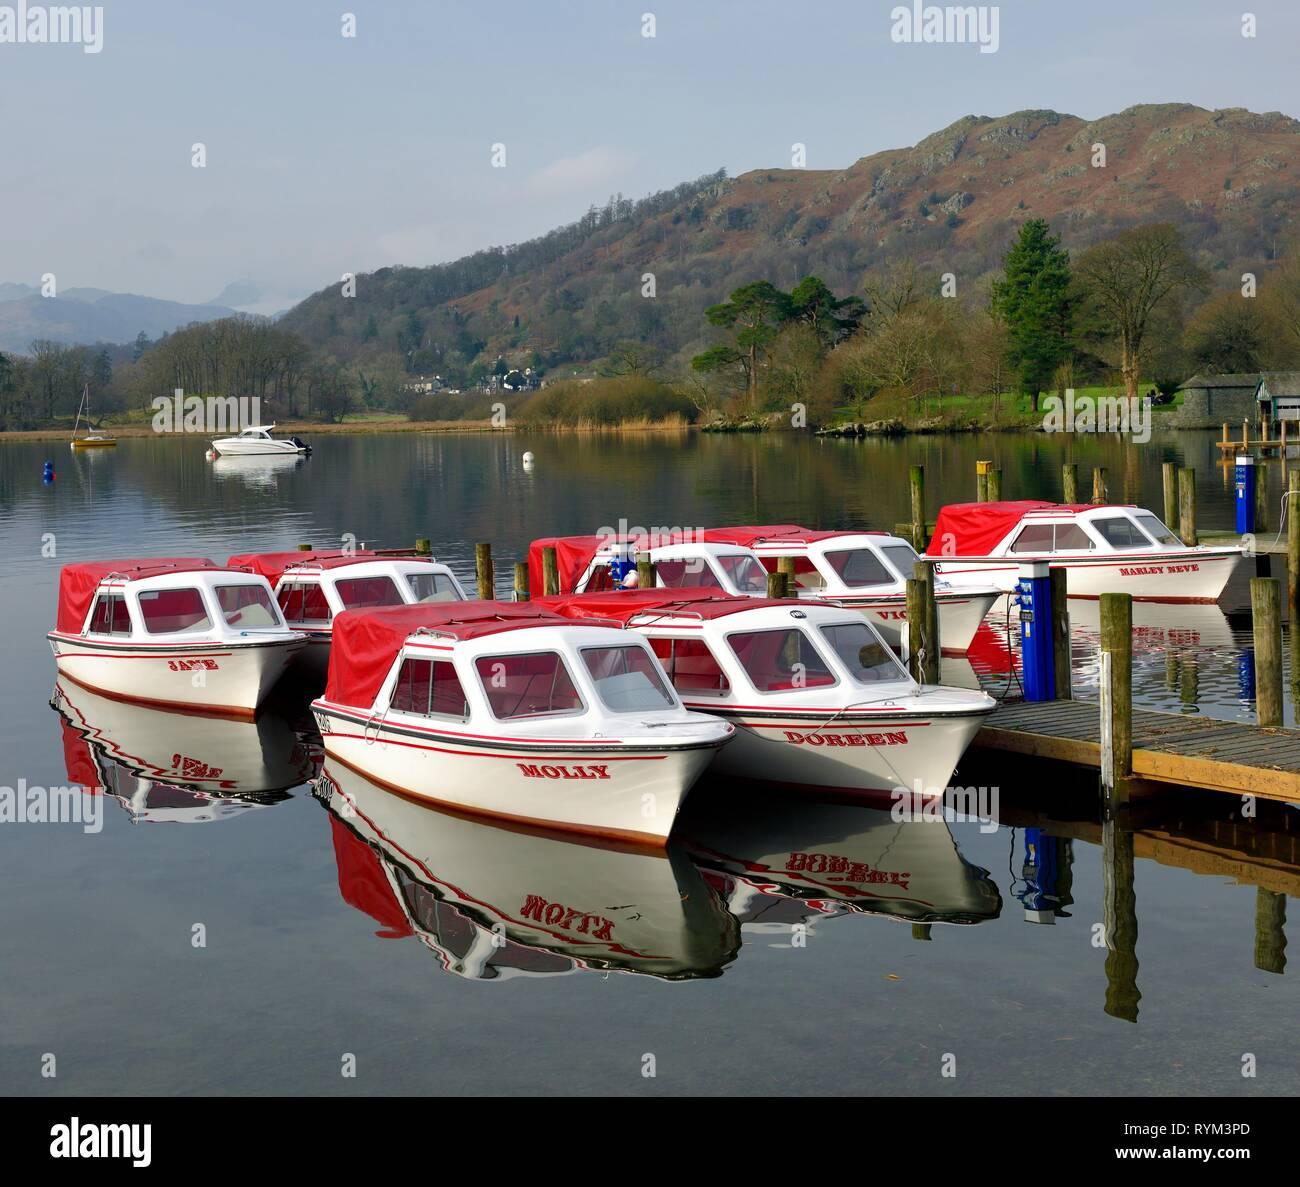 Pleasure boats with names,Ambleside,Lake Windermere,Lake District,Cumbria,England,UK Stock Photo